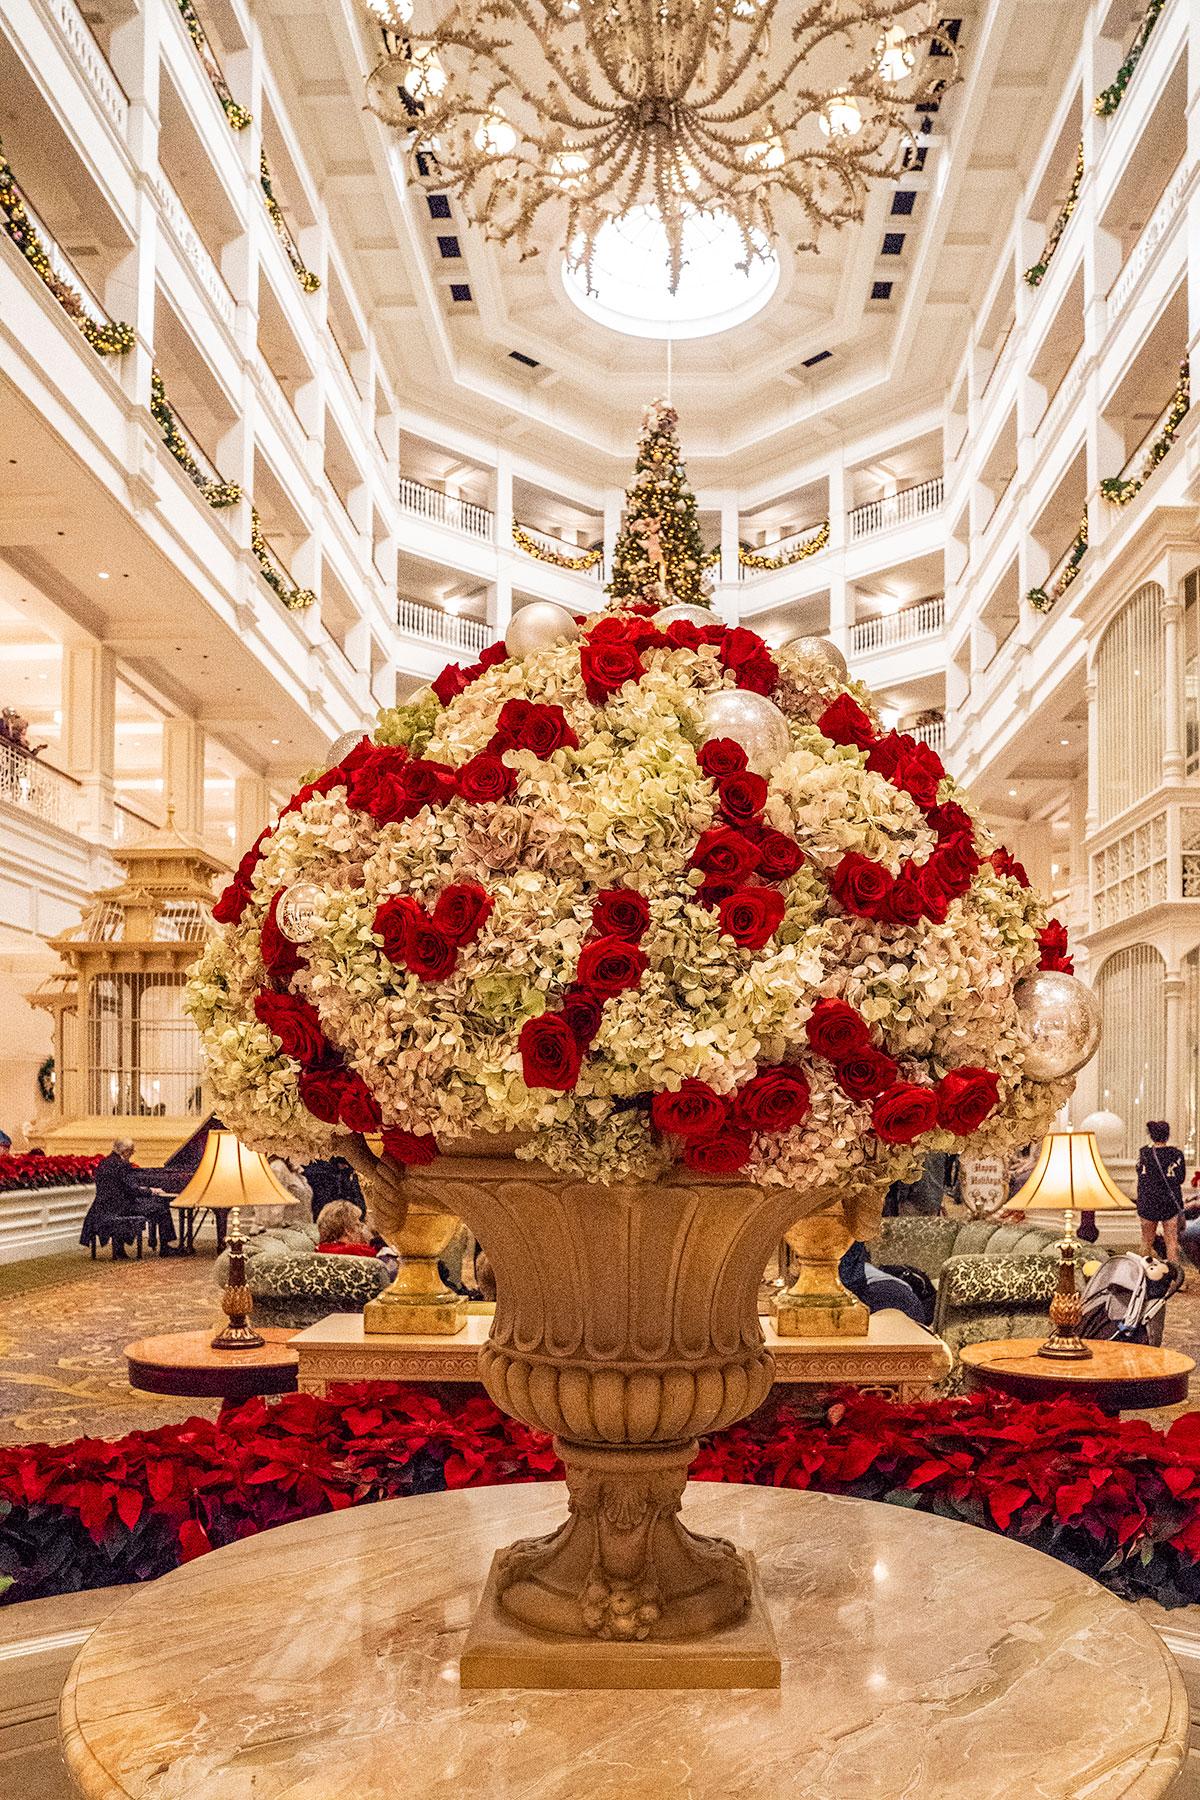 Grand-Floridian-at-Christmas-Walt-Disney-World